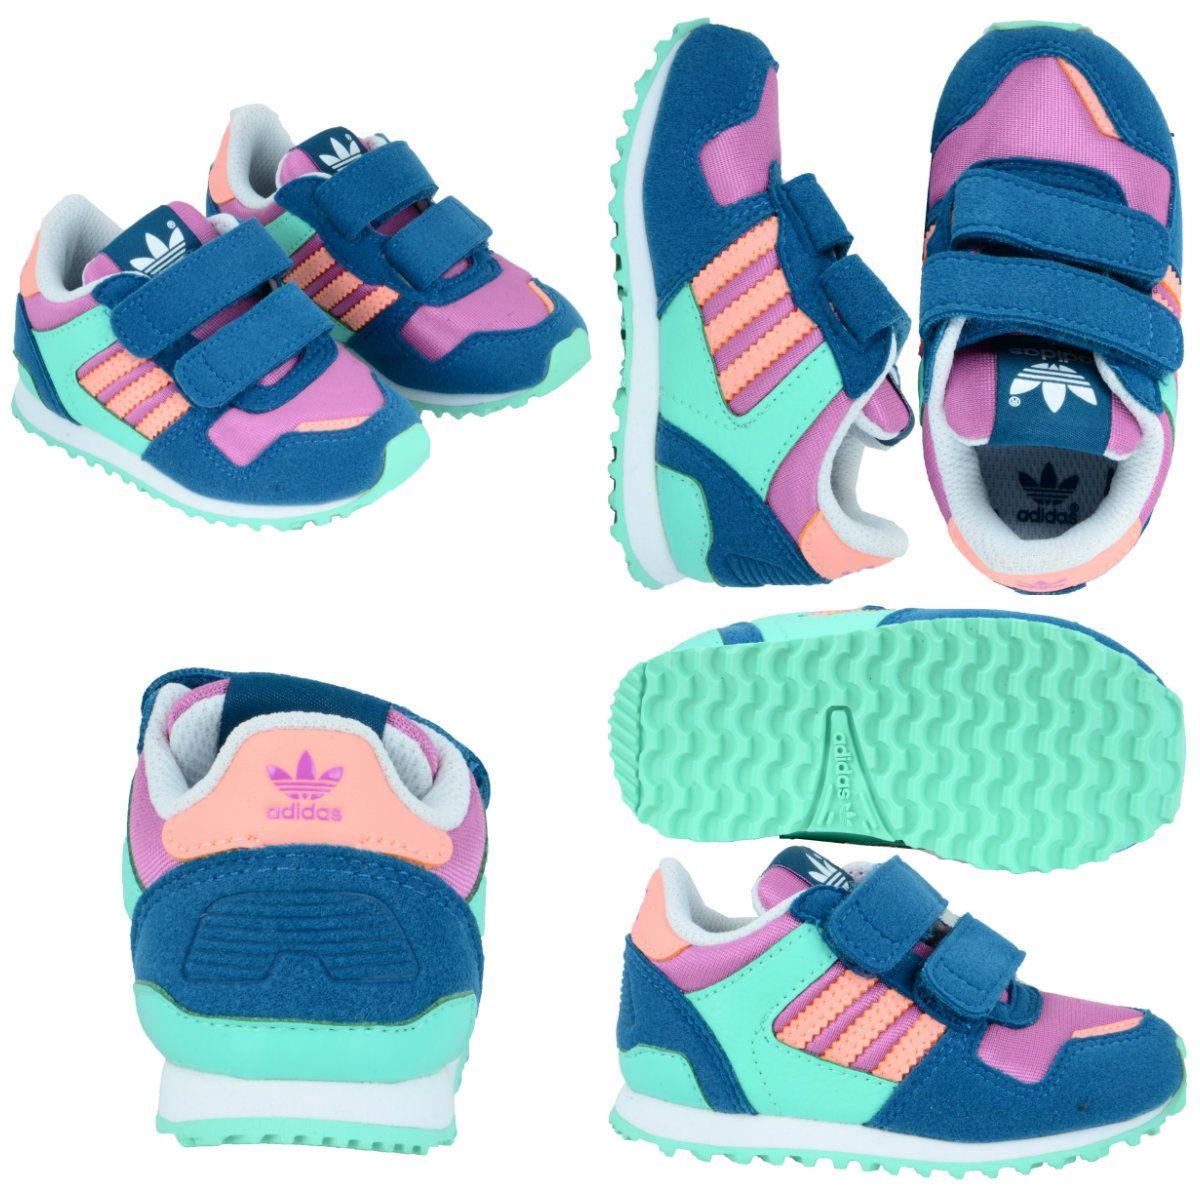 adidas zx 700 kids